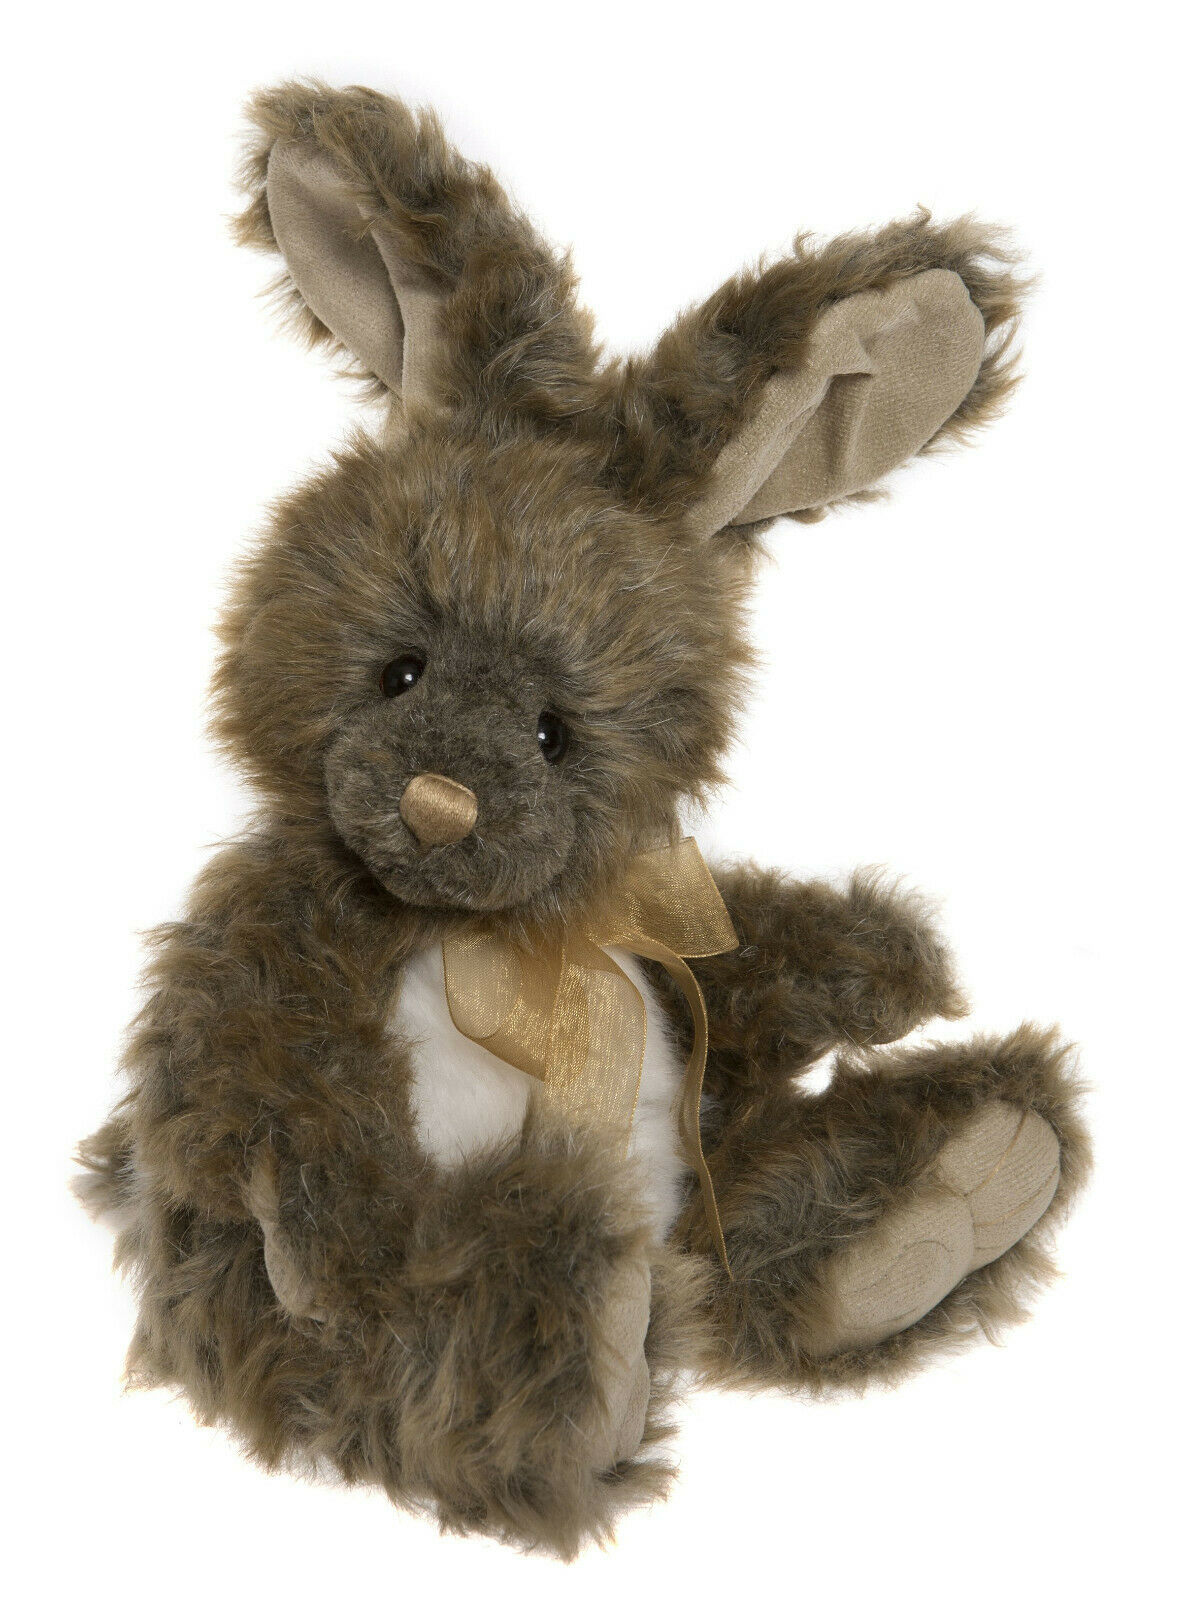 Charlie Bears Hop CB 185179B Kollektion 2018 für Kinder und Sammler